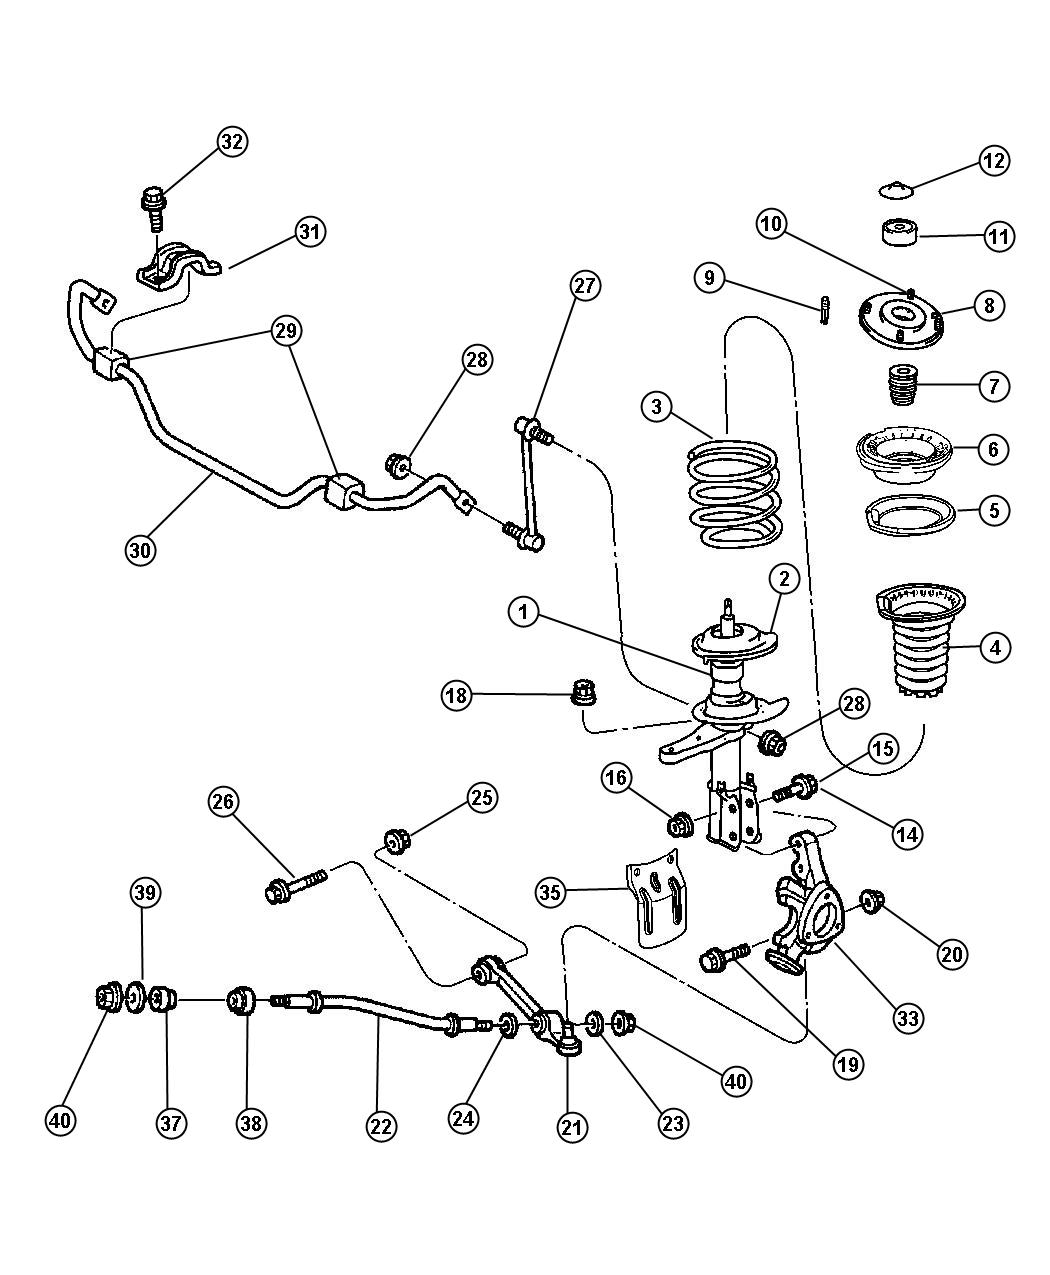 2000 chrysler lhs washer  flat  21mm id  washer  tension strut  tension strut or bushing